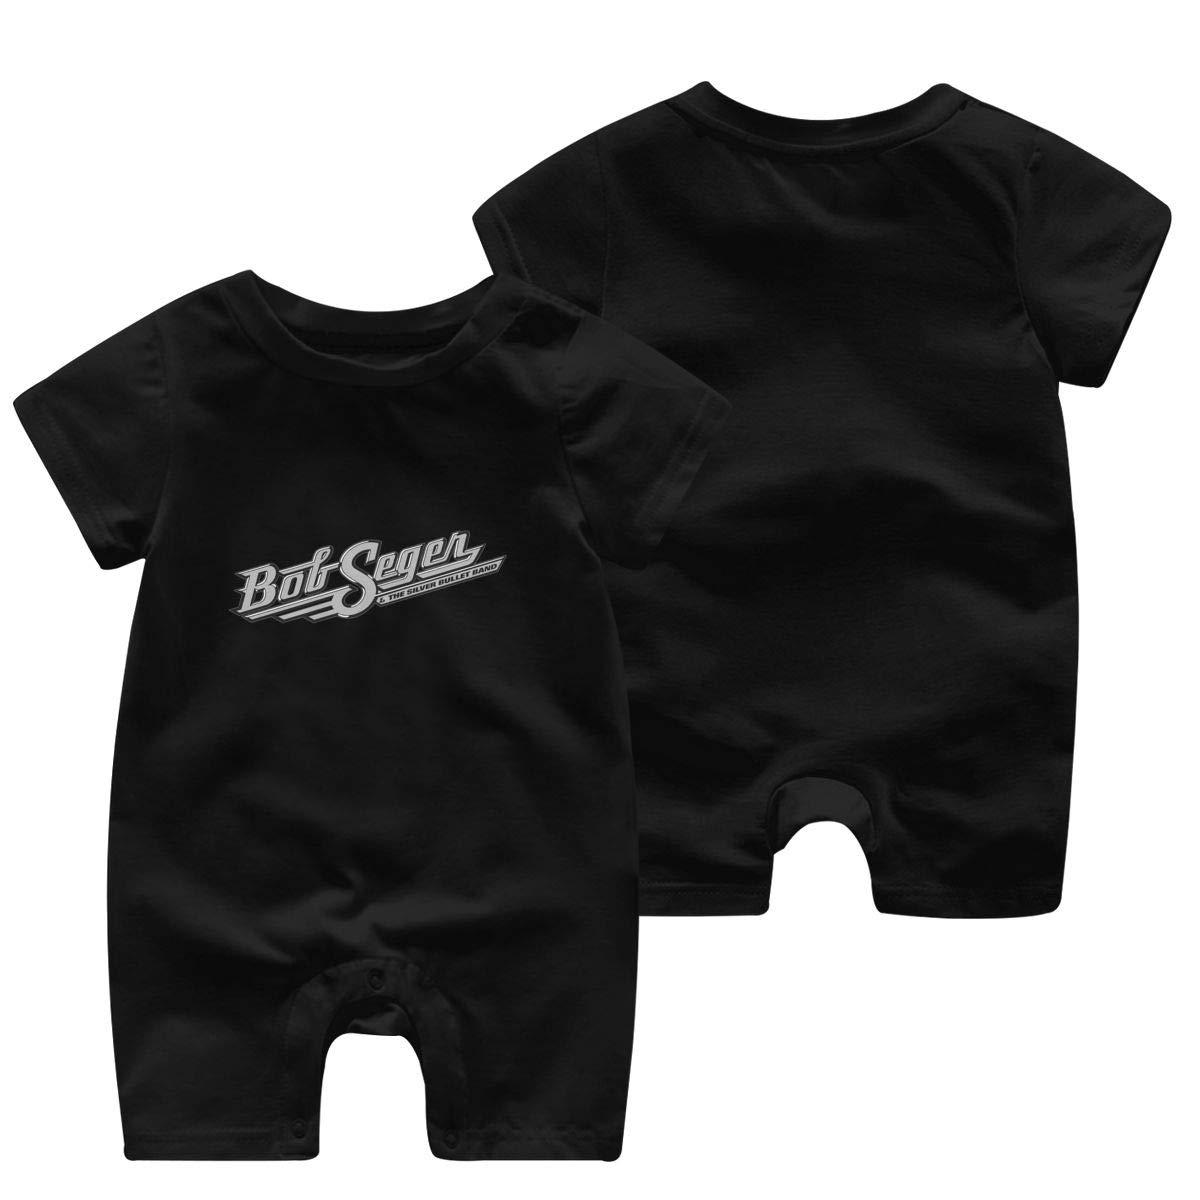 WangSiwe Bob Seger Infant Boy Girl Short Sleeve Jumpsuit Summer Outfits